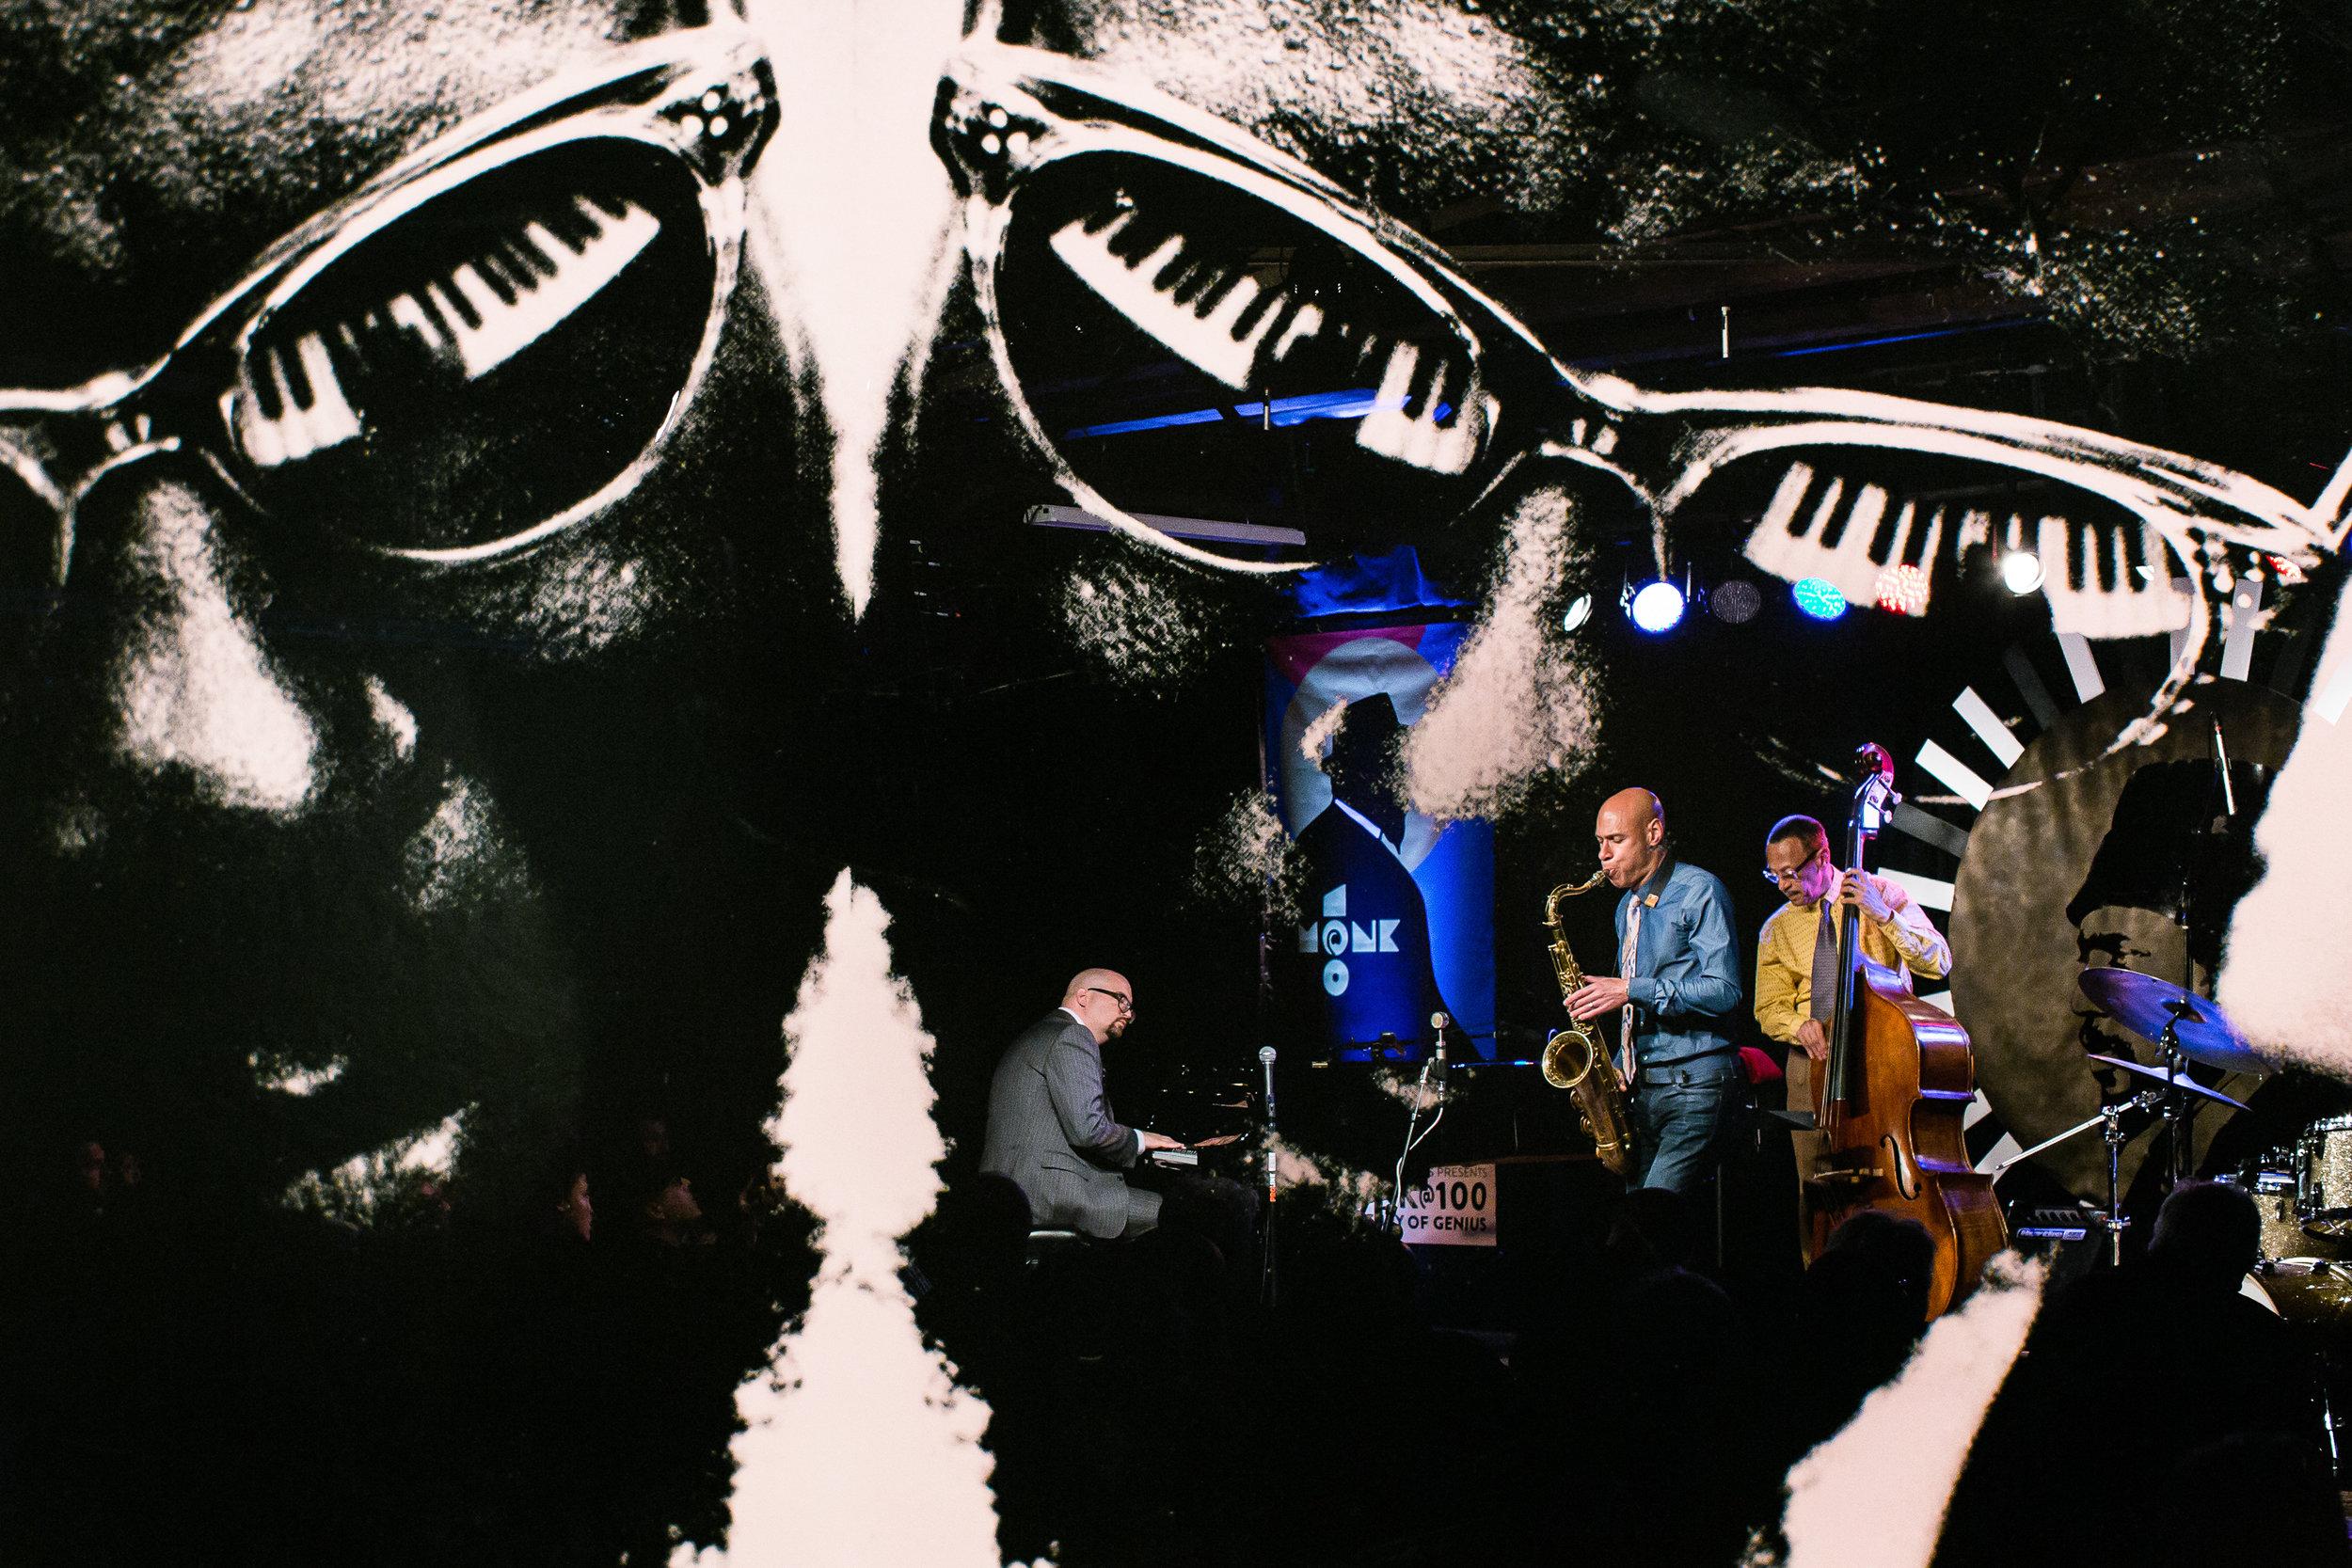 Joshua Redman Duke Performances Jazz Monk@100 Photo